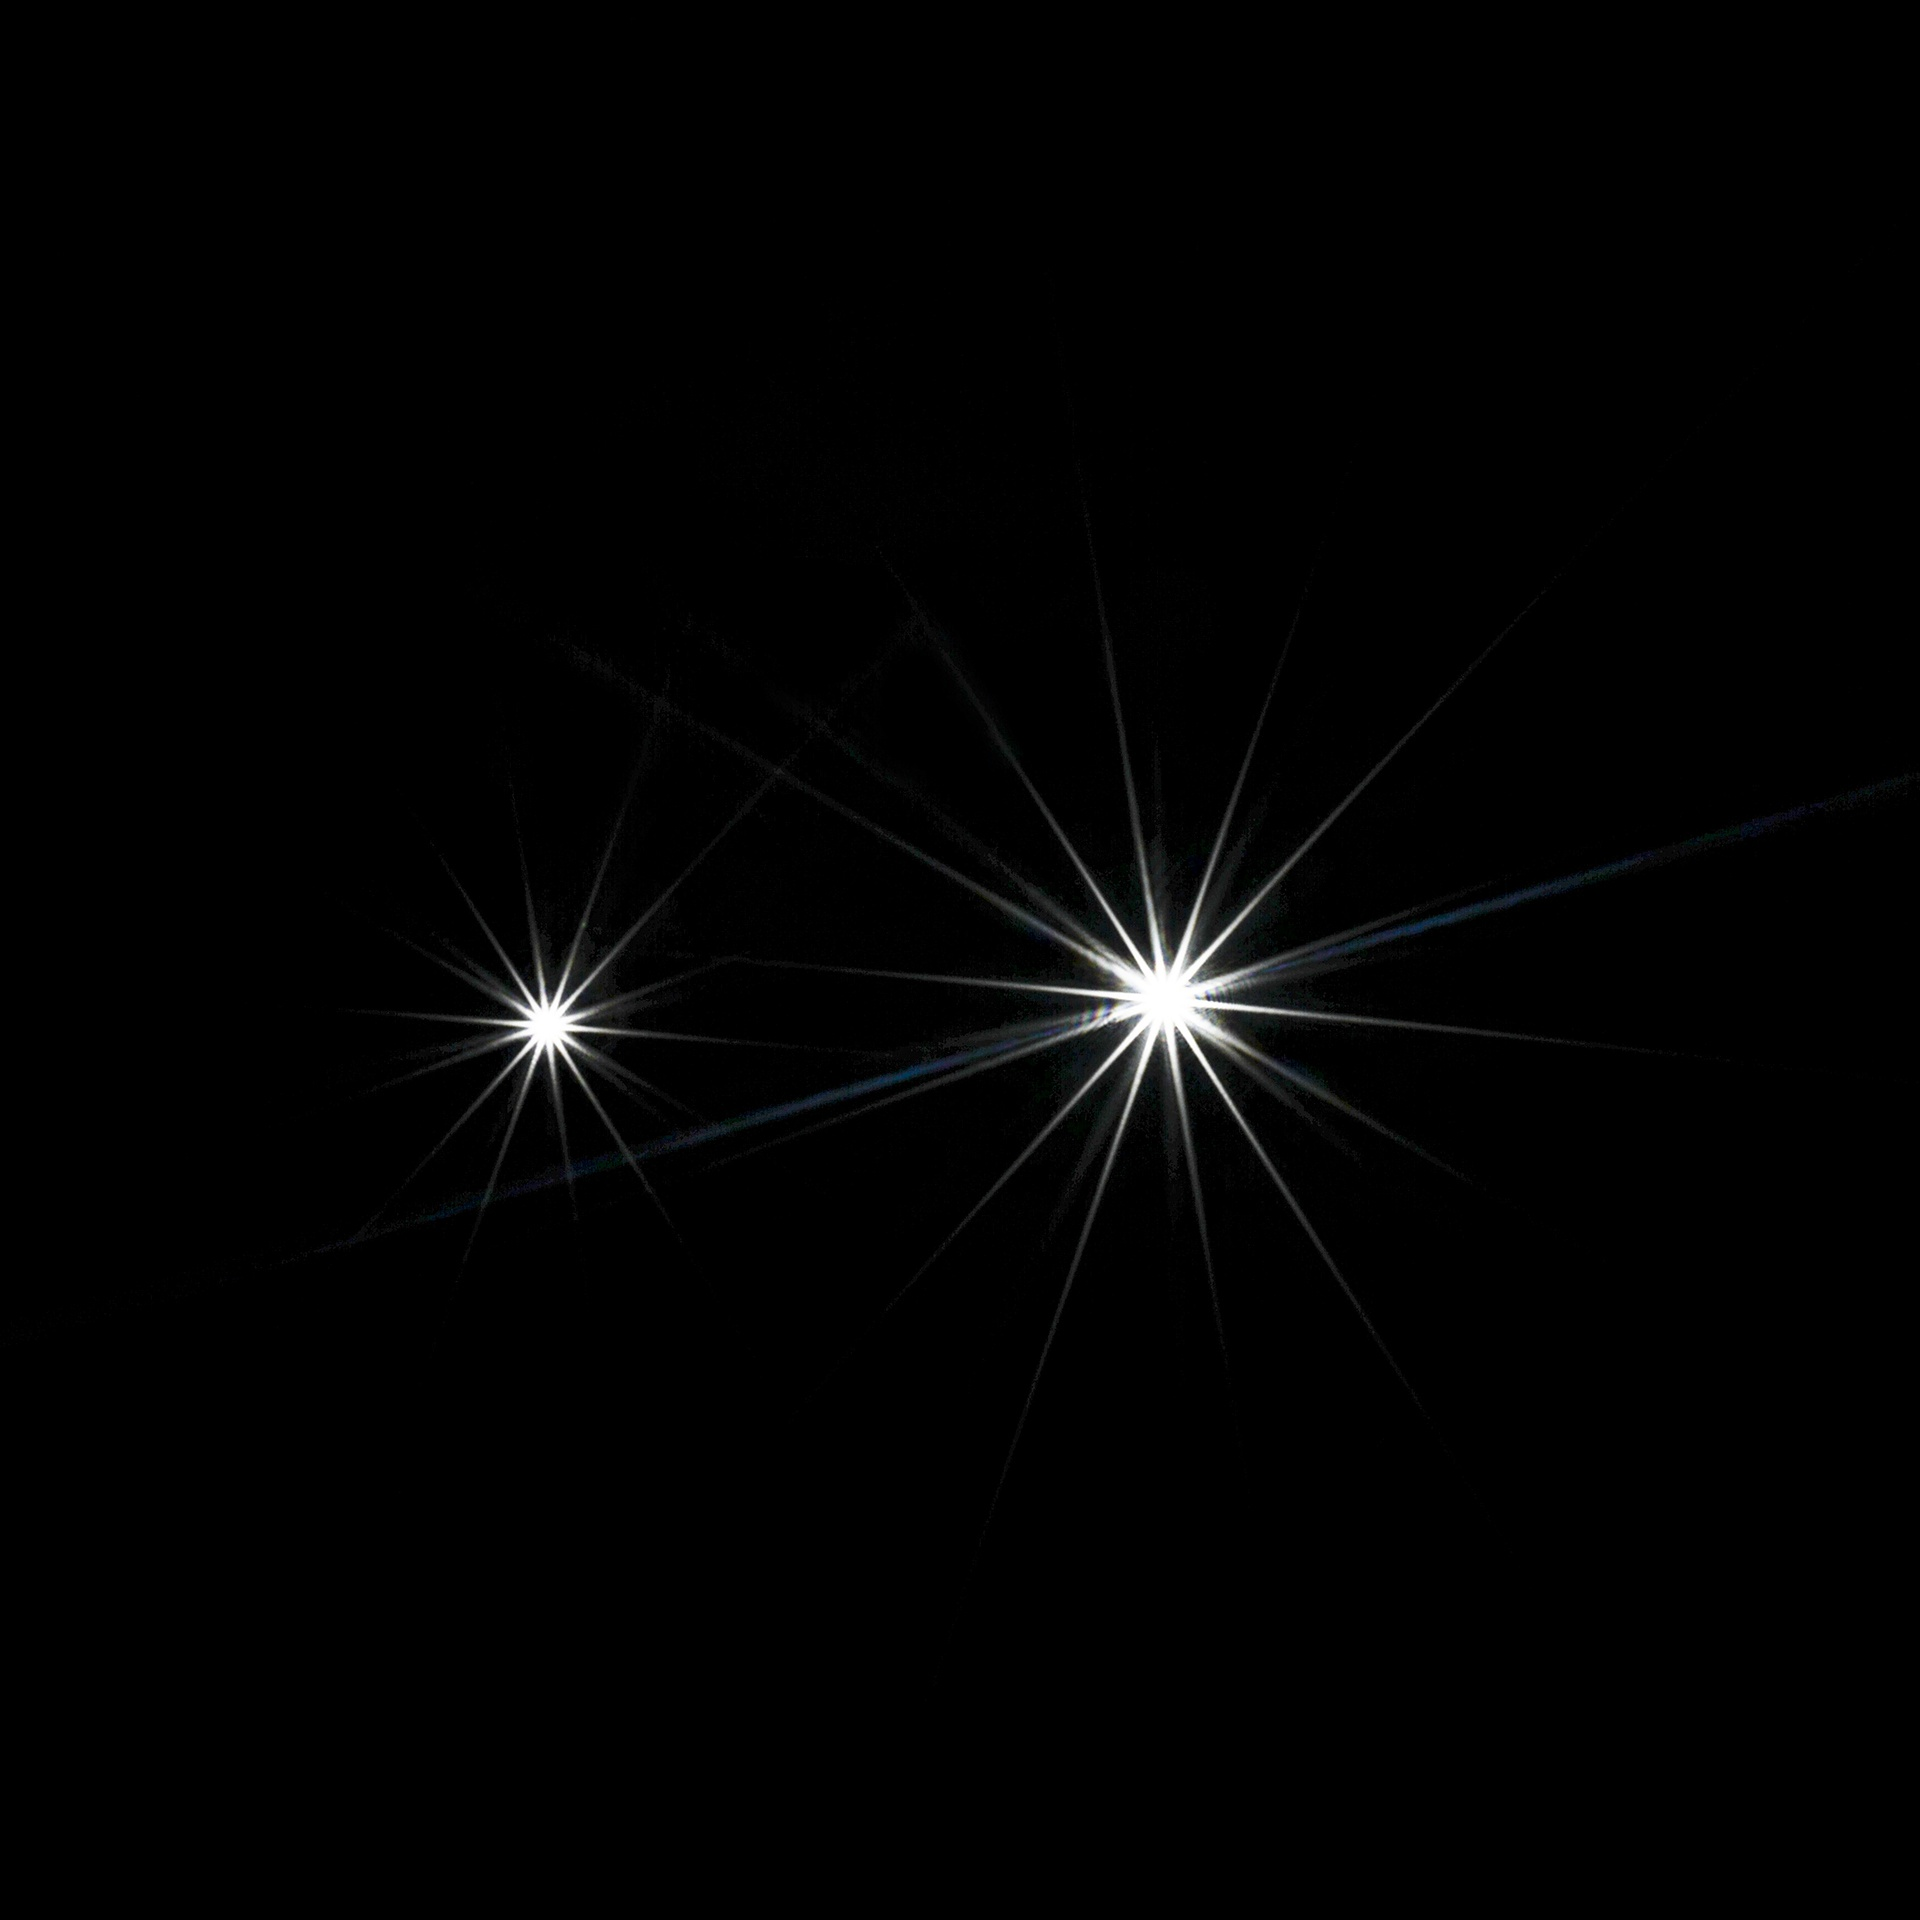 Le stelle... by SantinaSorbello